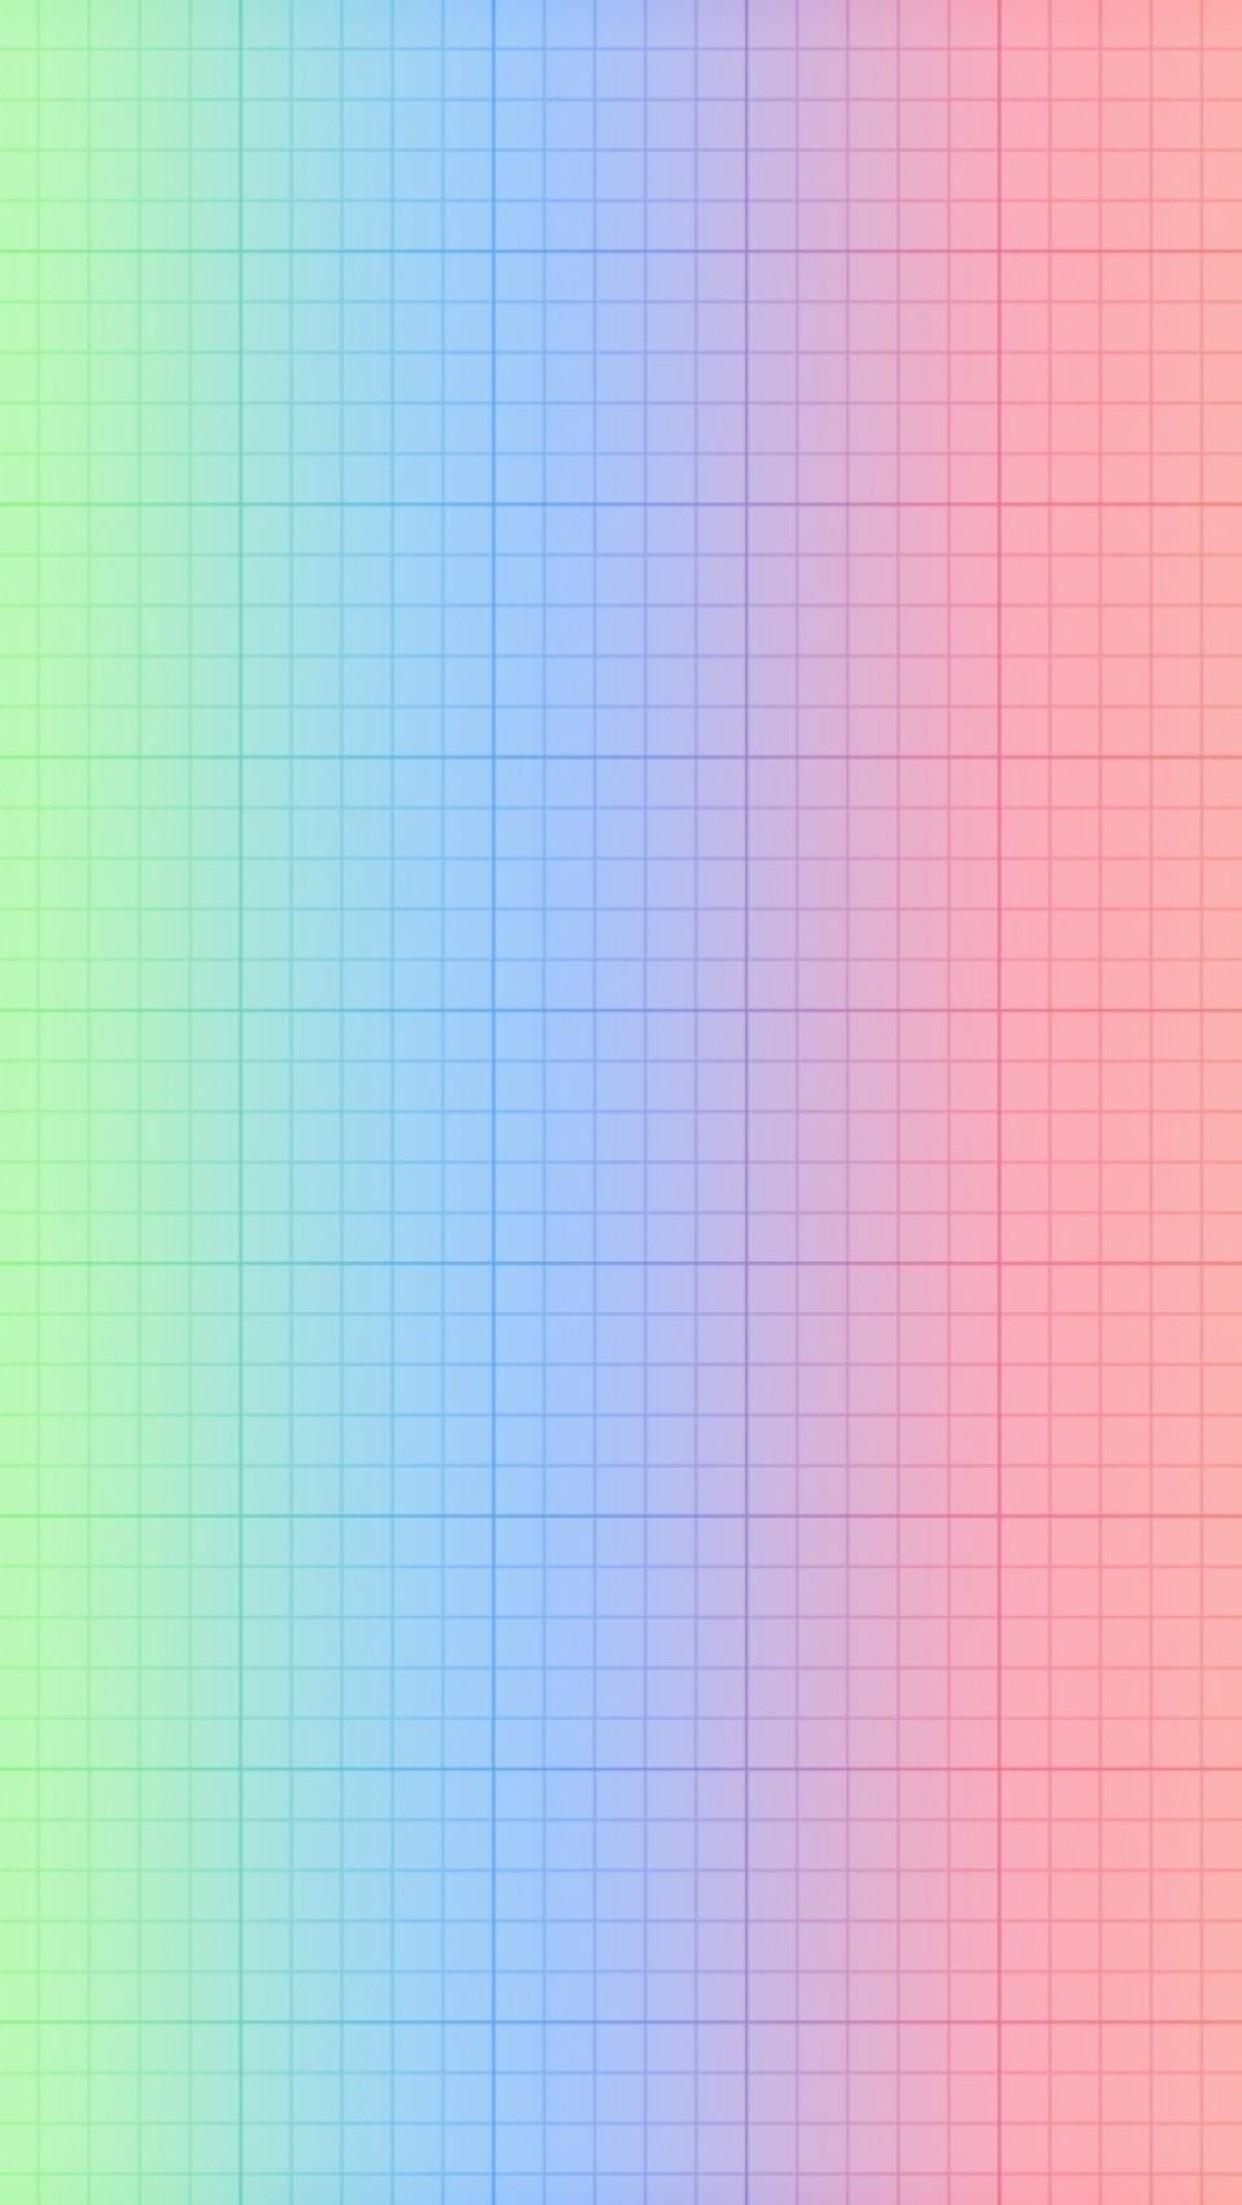 pastel colors wallpaper  u00b7 u2460 wallpapertag